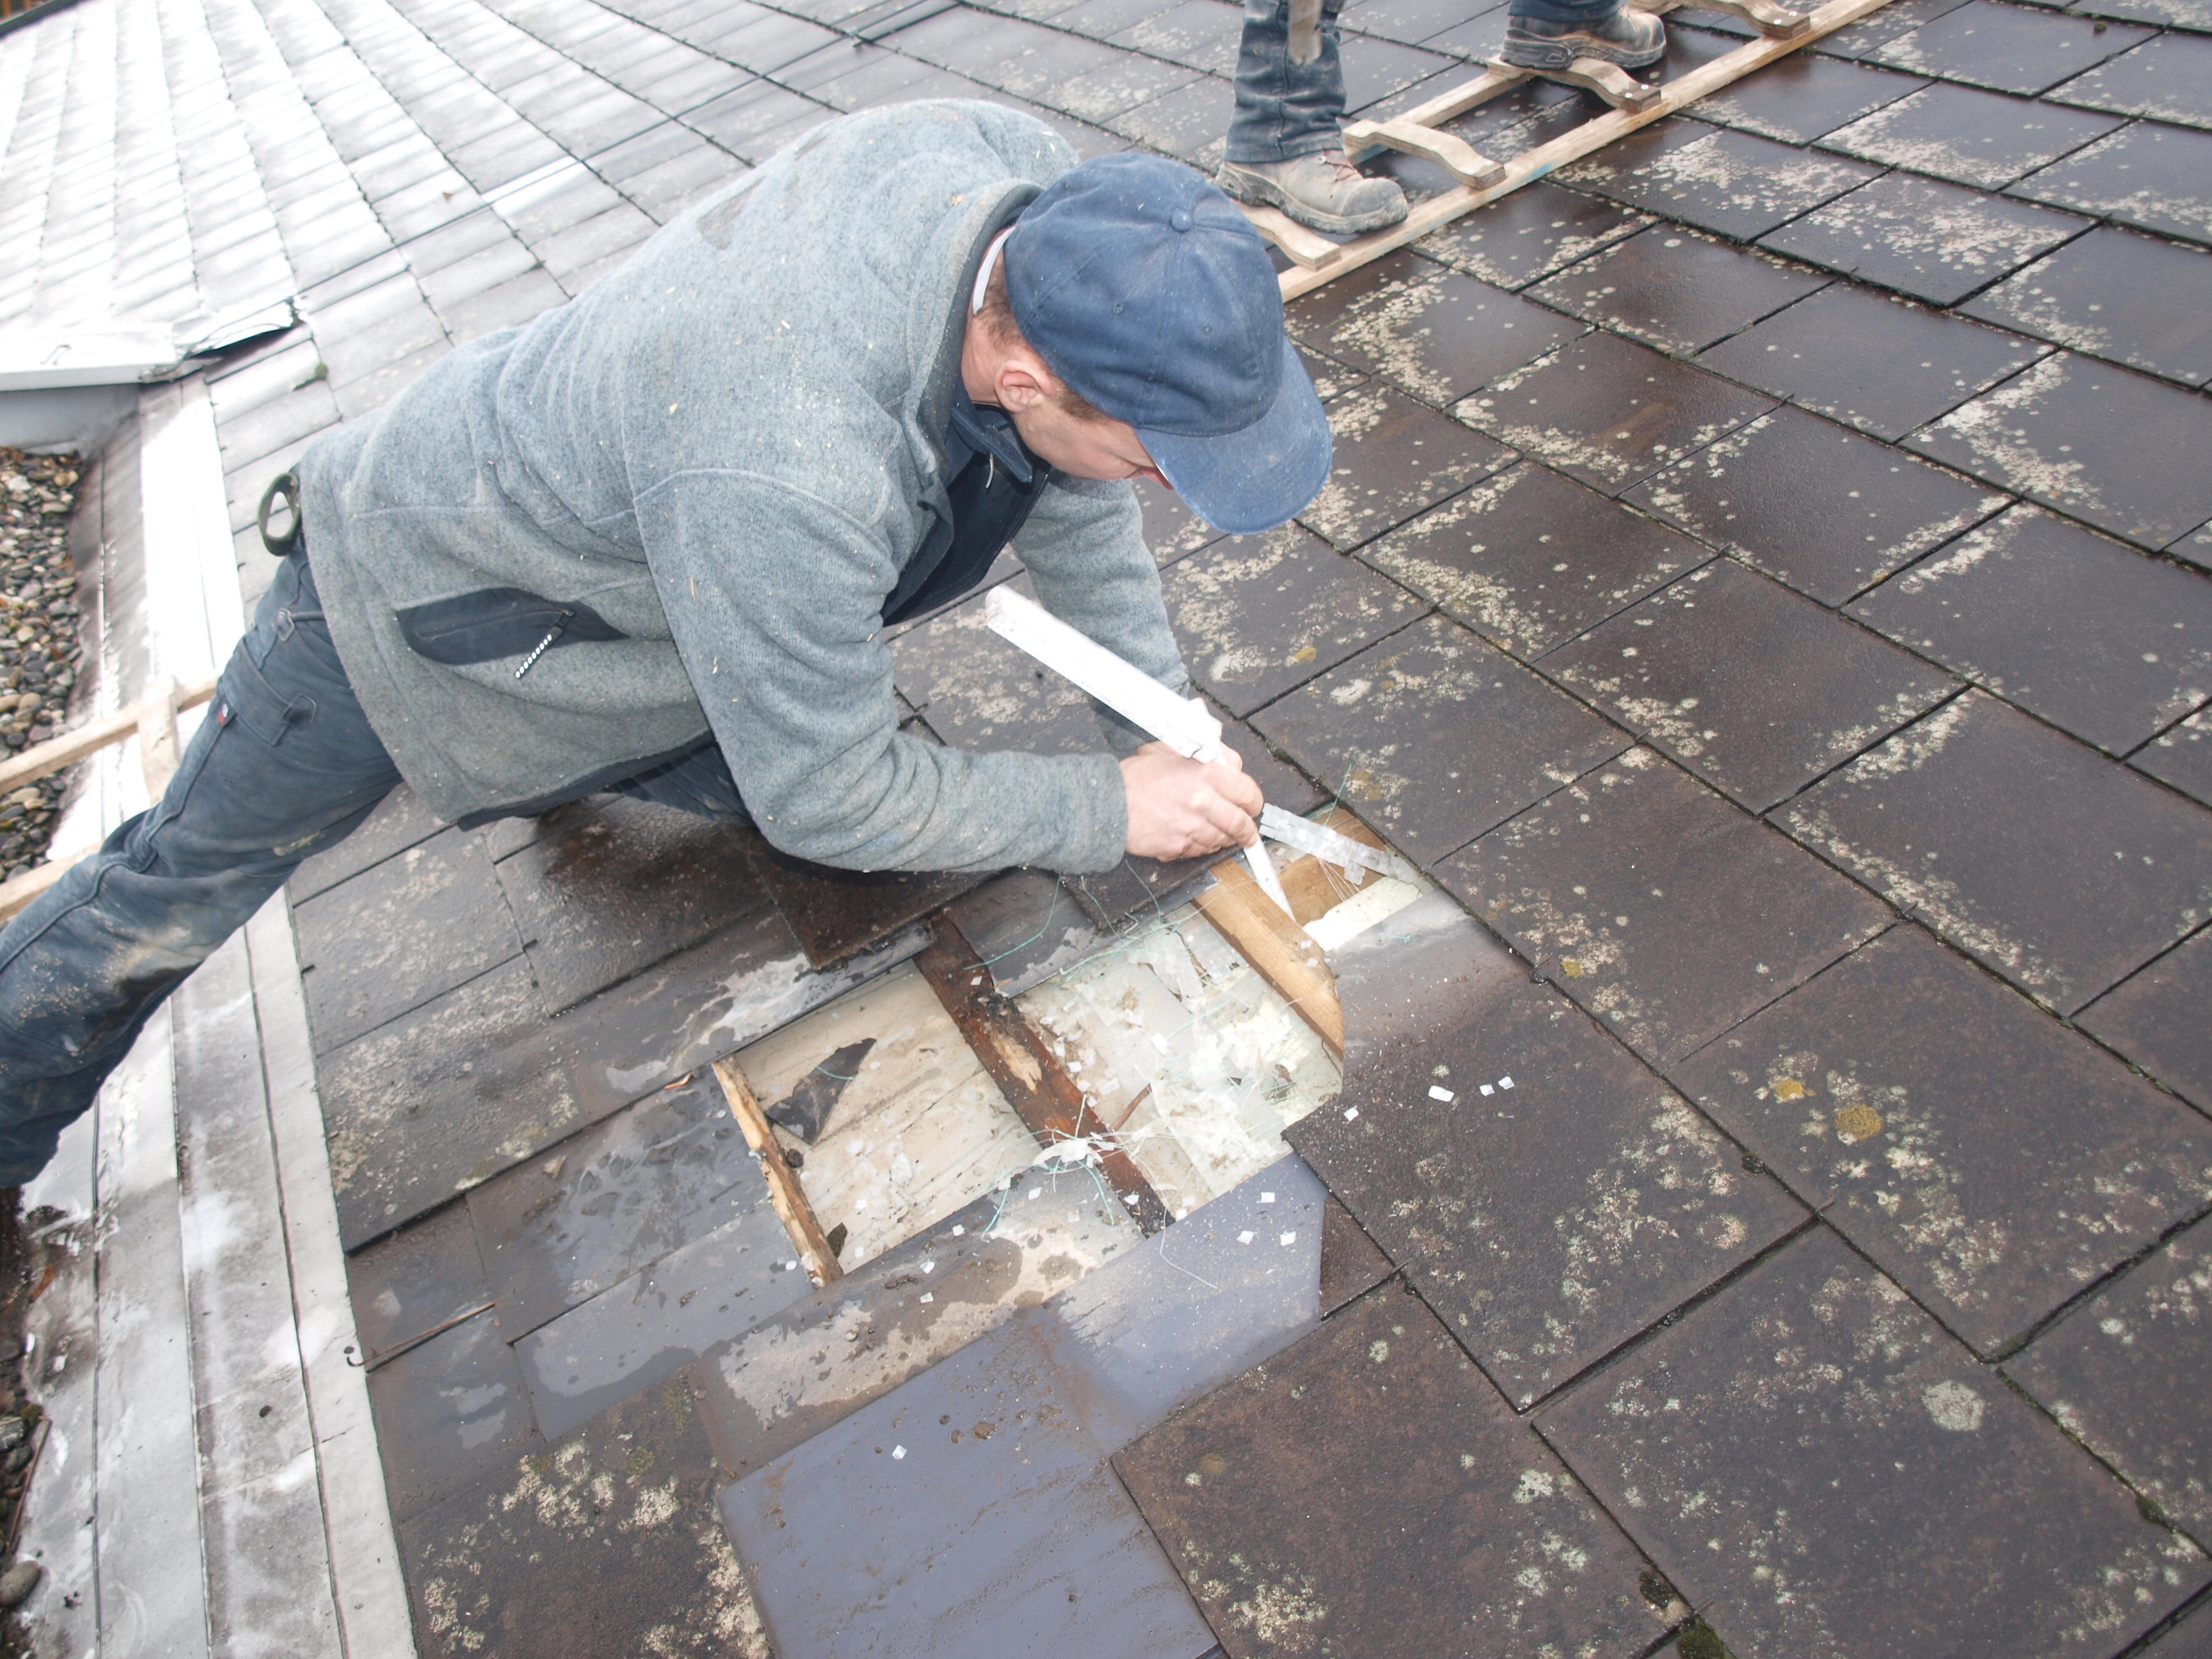 Top Lahr Friesenheim-Oberschopfheim Dach muss saniert werden #VI_18